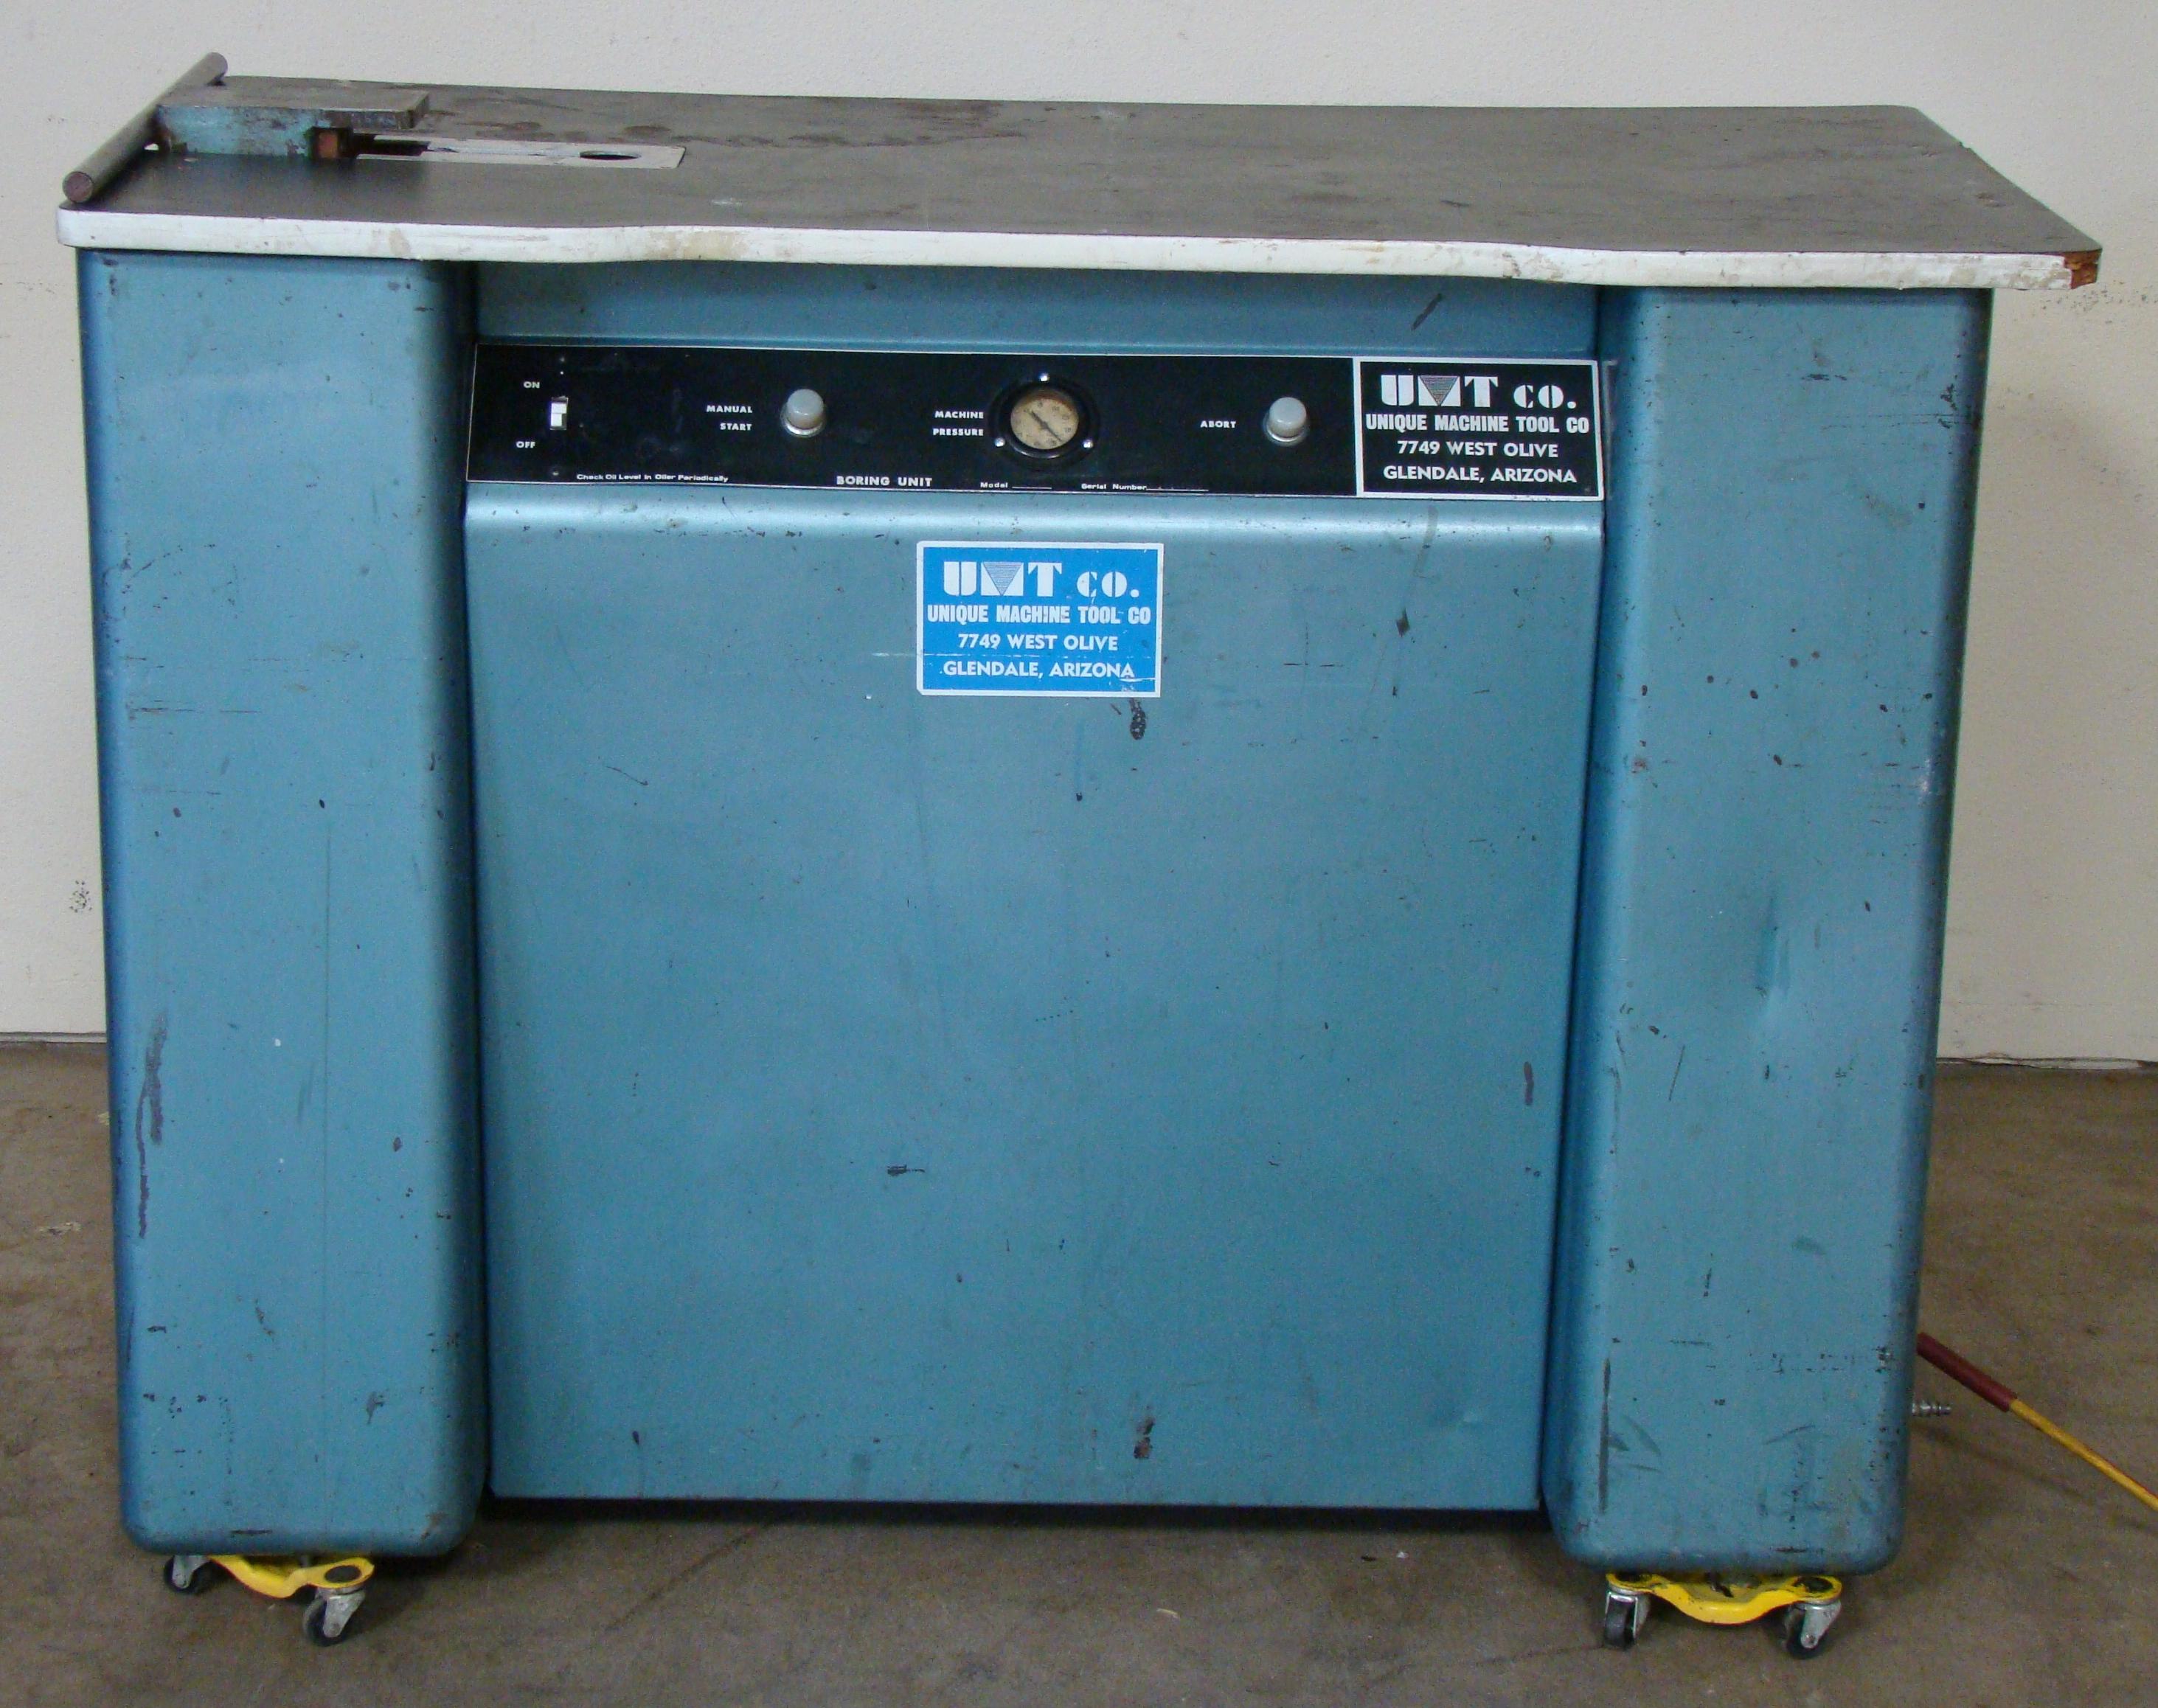 Unique Machine 1 Spindle Pocket Boring Machine, 115 Volts (On Wheels)